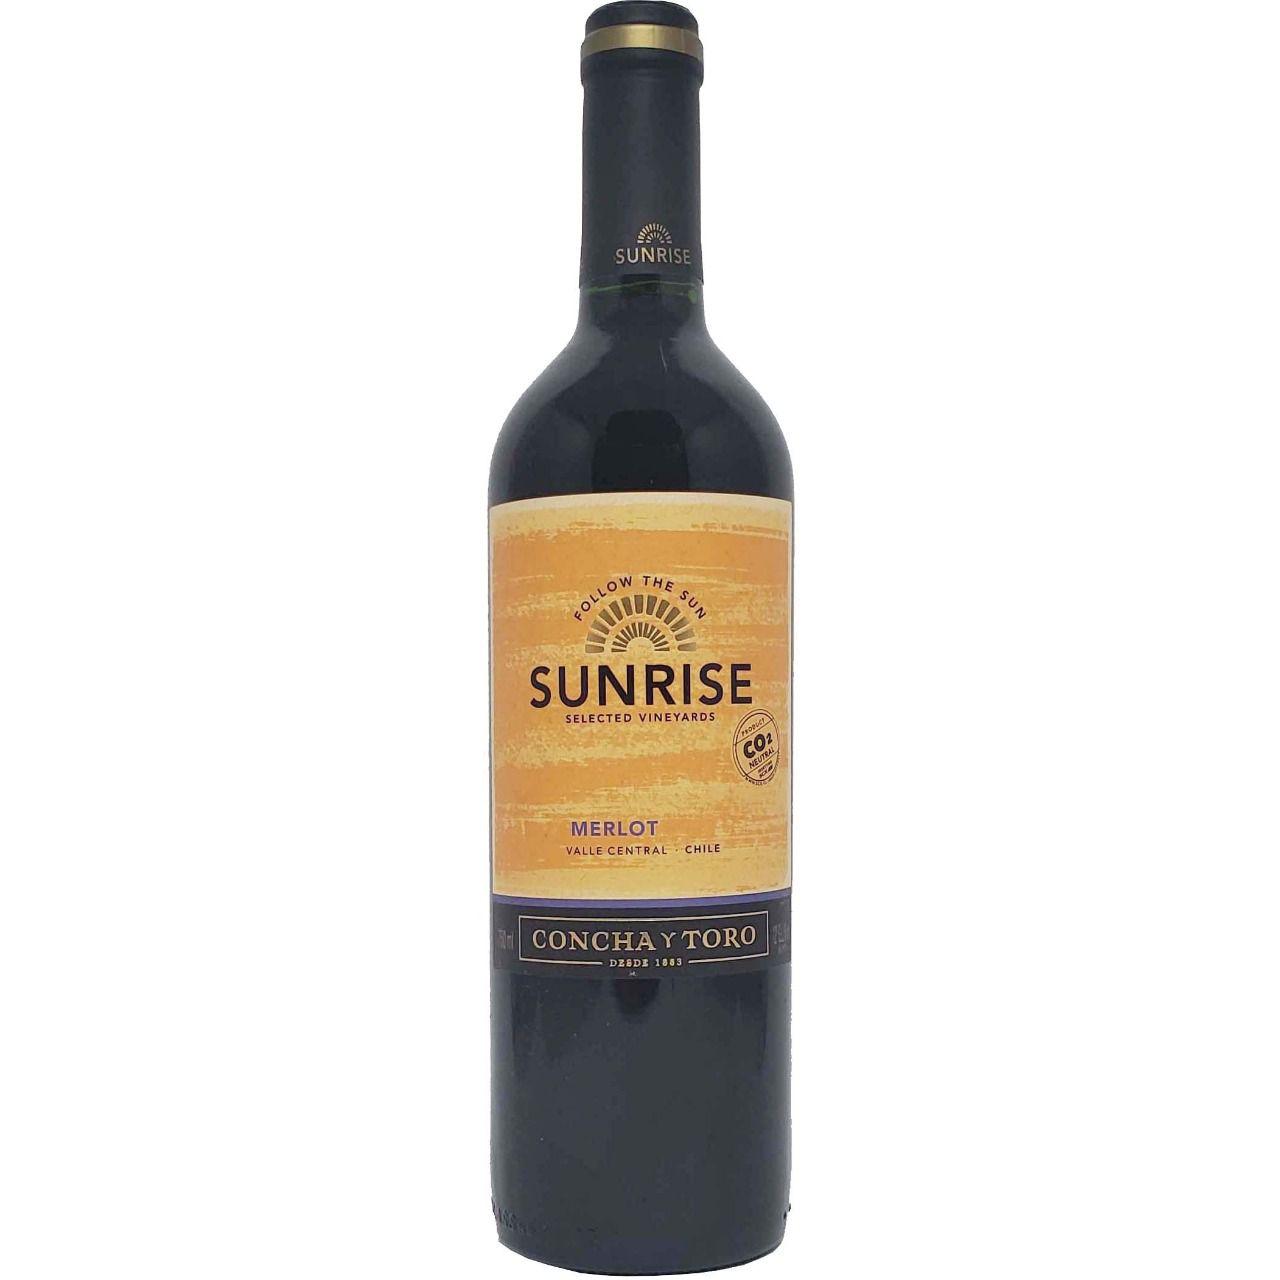 Vinho Tinto Sunrise Selected Vineyards Concha y Toro Merlot  - 750ml -